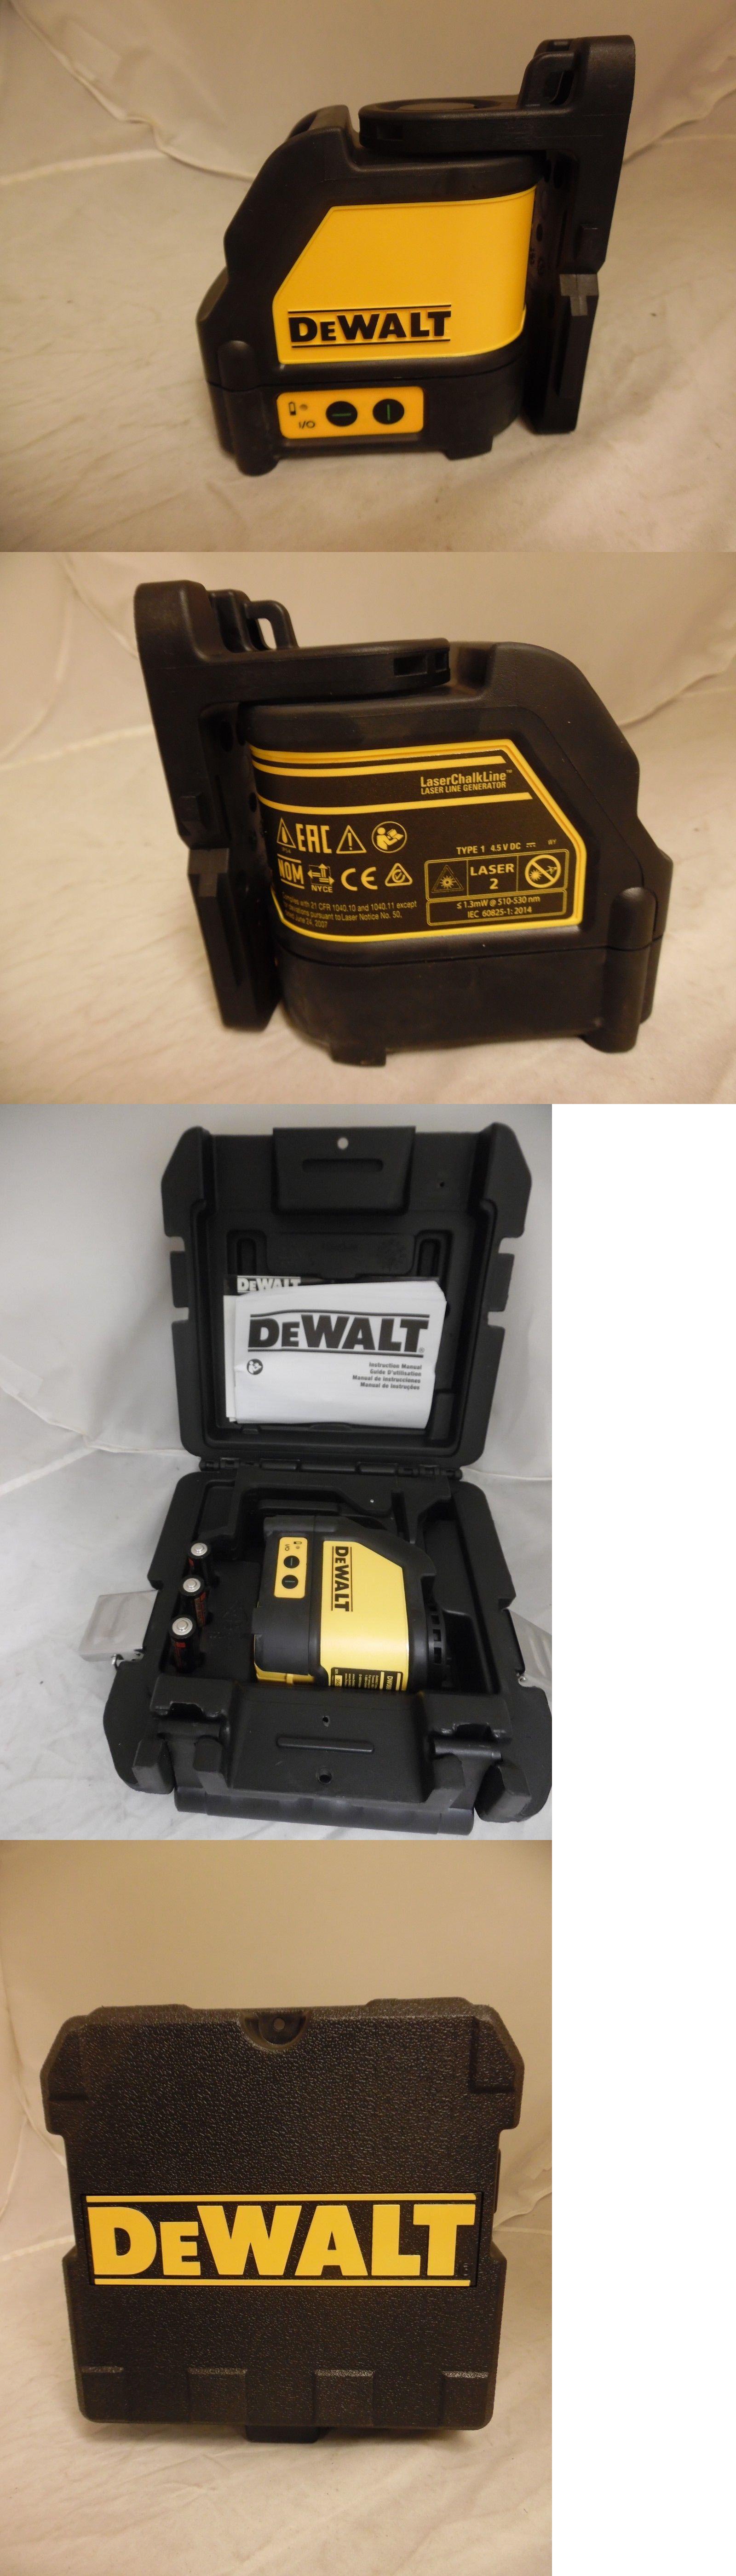 Laser Measuring Tools 126396 Dewalt Dw088cg Cross Line Green Laser Level Buy It Now Only 159 99 On Ebay La Green Laser Measuring Tools Dewalt